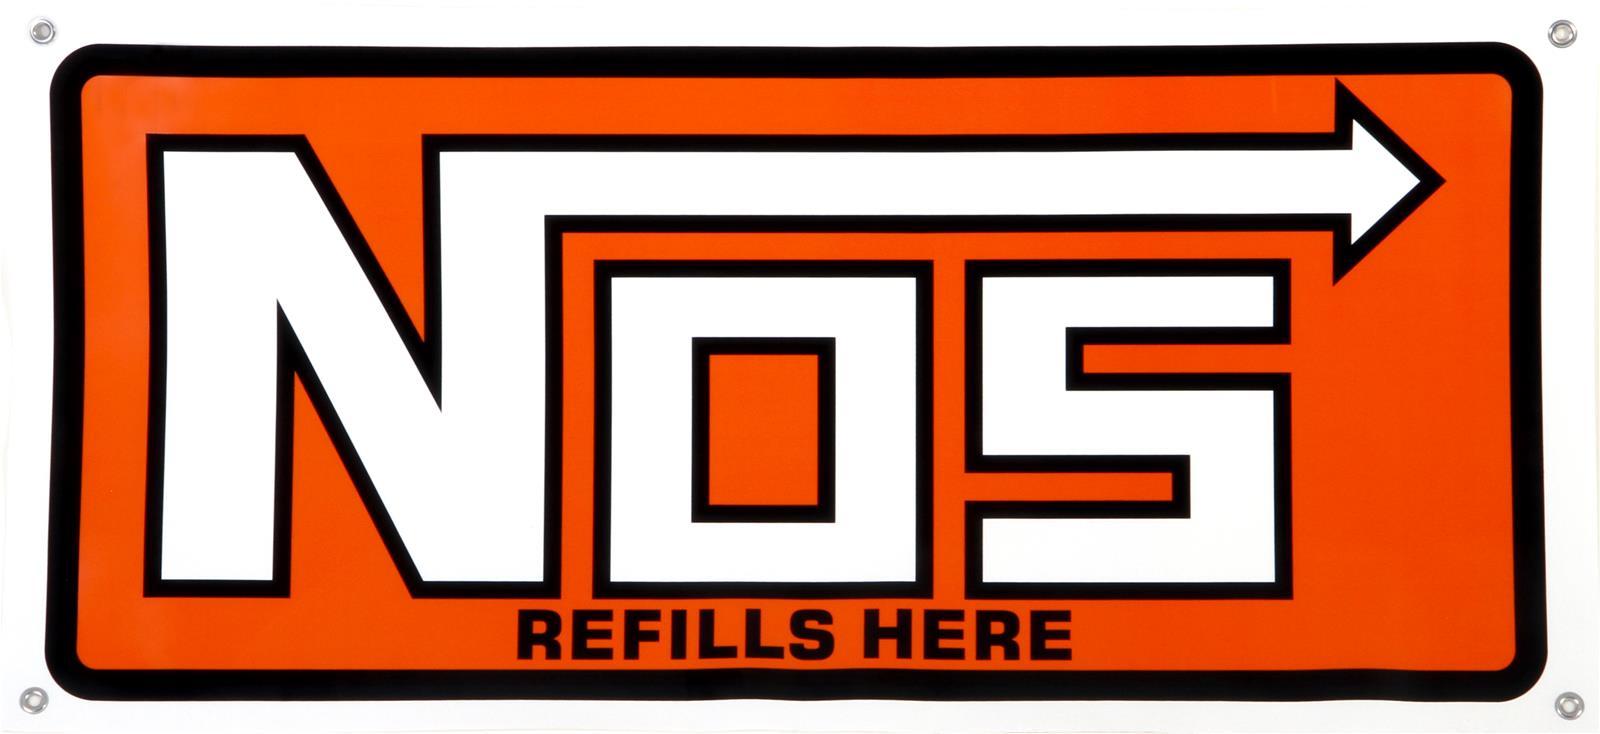 NOS REFILLS